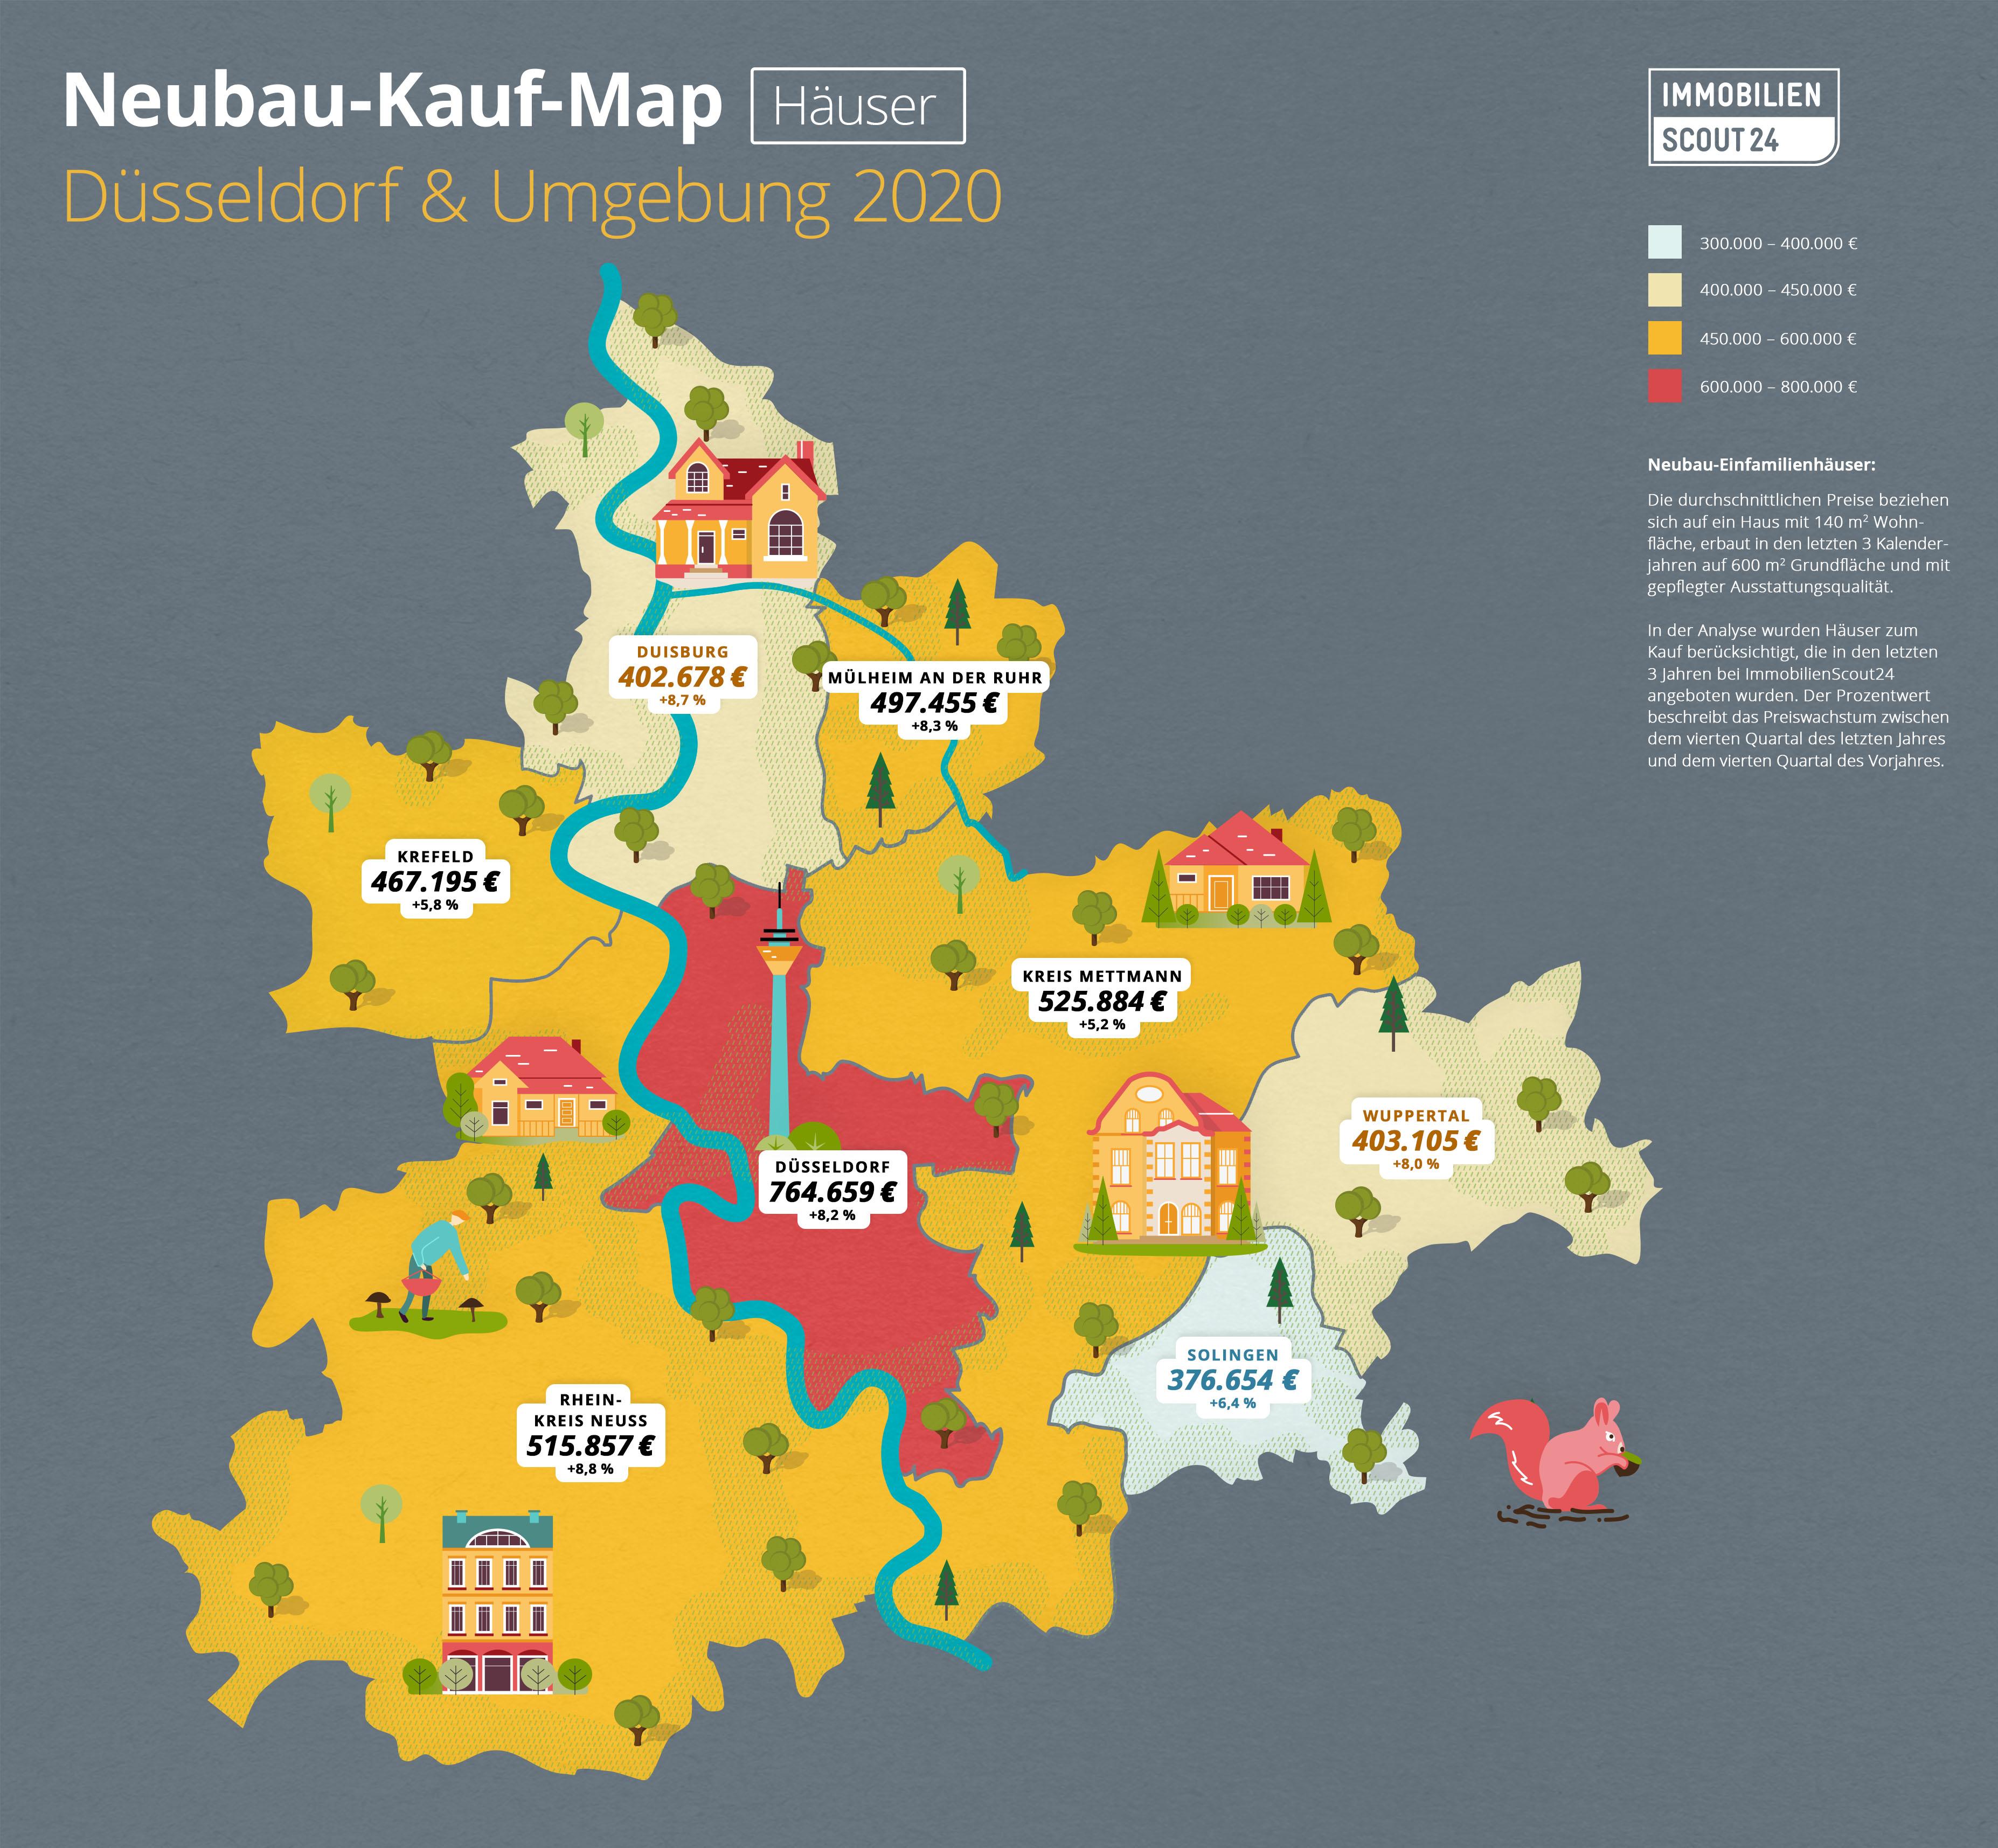 Hauspreise In Dusseldorf Immobilienpreise 2020